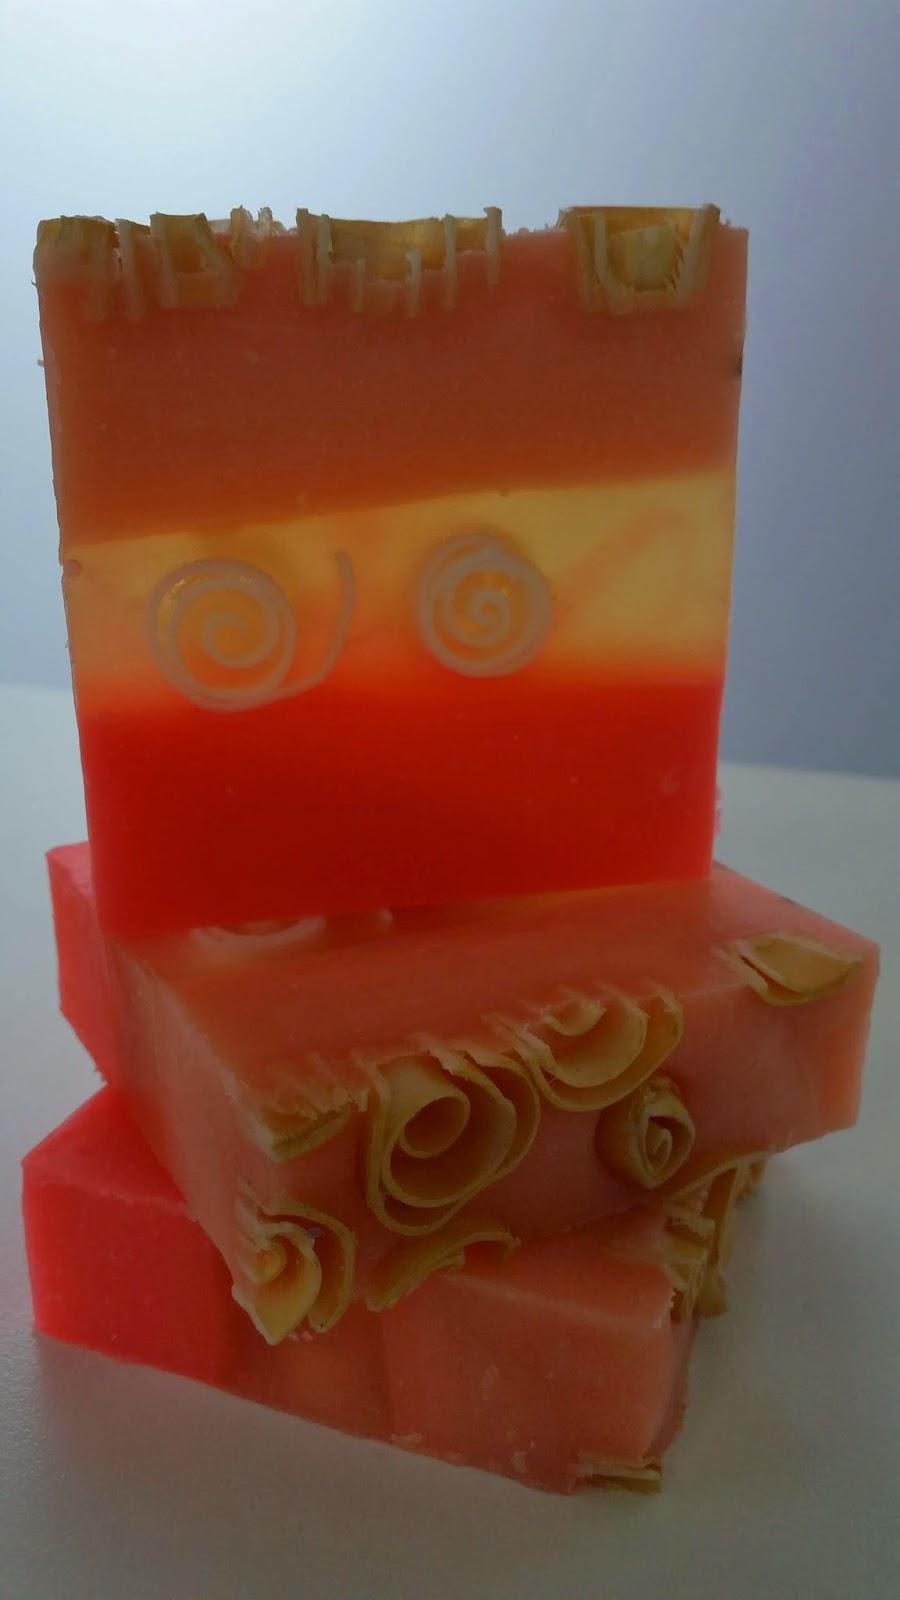 Jabón de Lino en Capas - La Despensa del Jabón